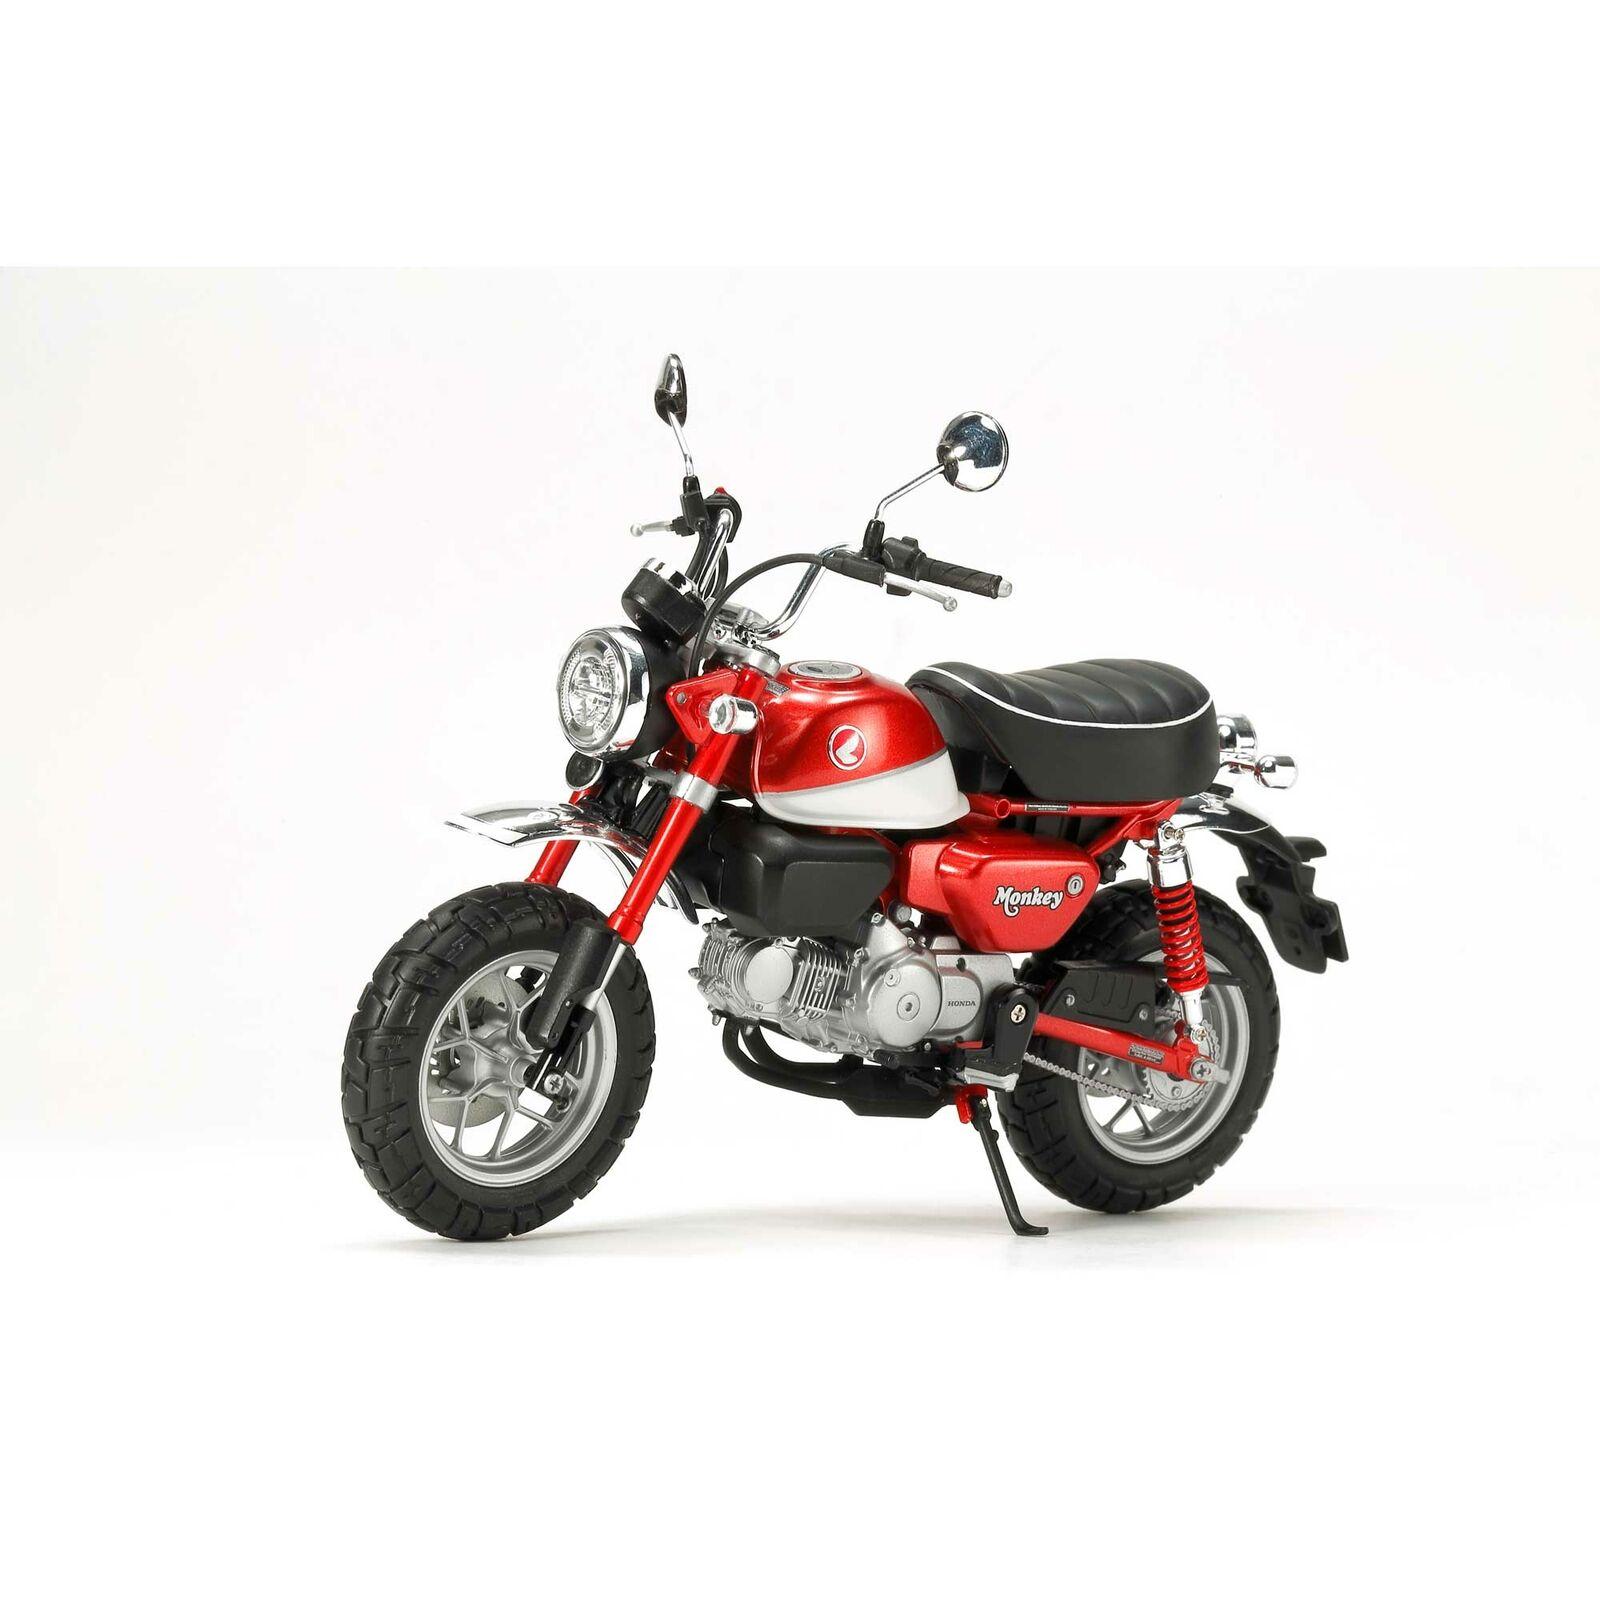 Tamiya 1 12 Motorcycle Series No134 Honda Monkey 125 Plastic Model 14134 Japan For Sale Online Ebay